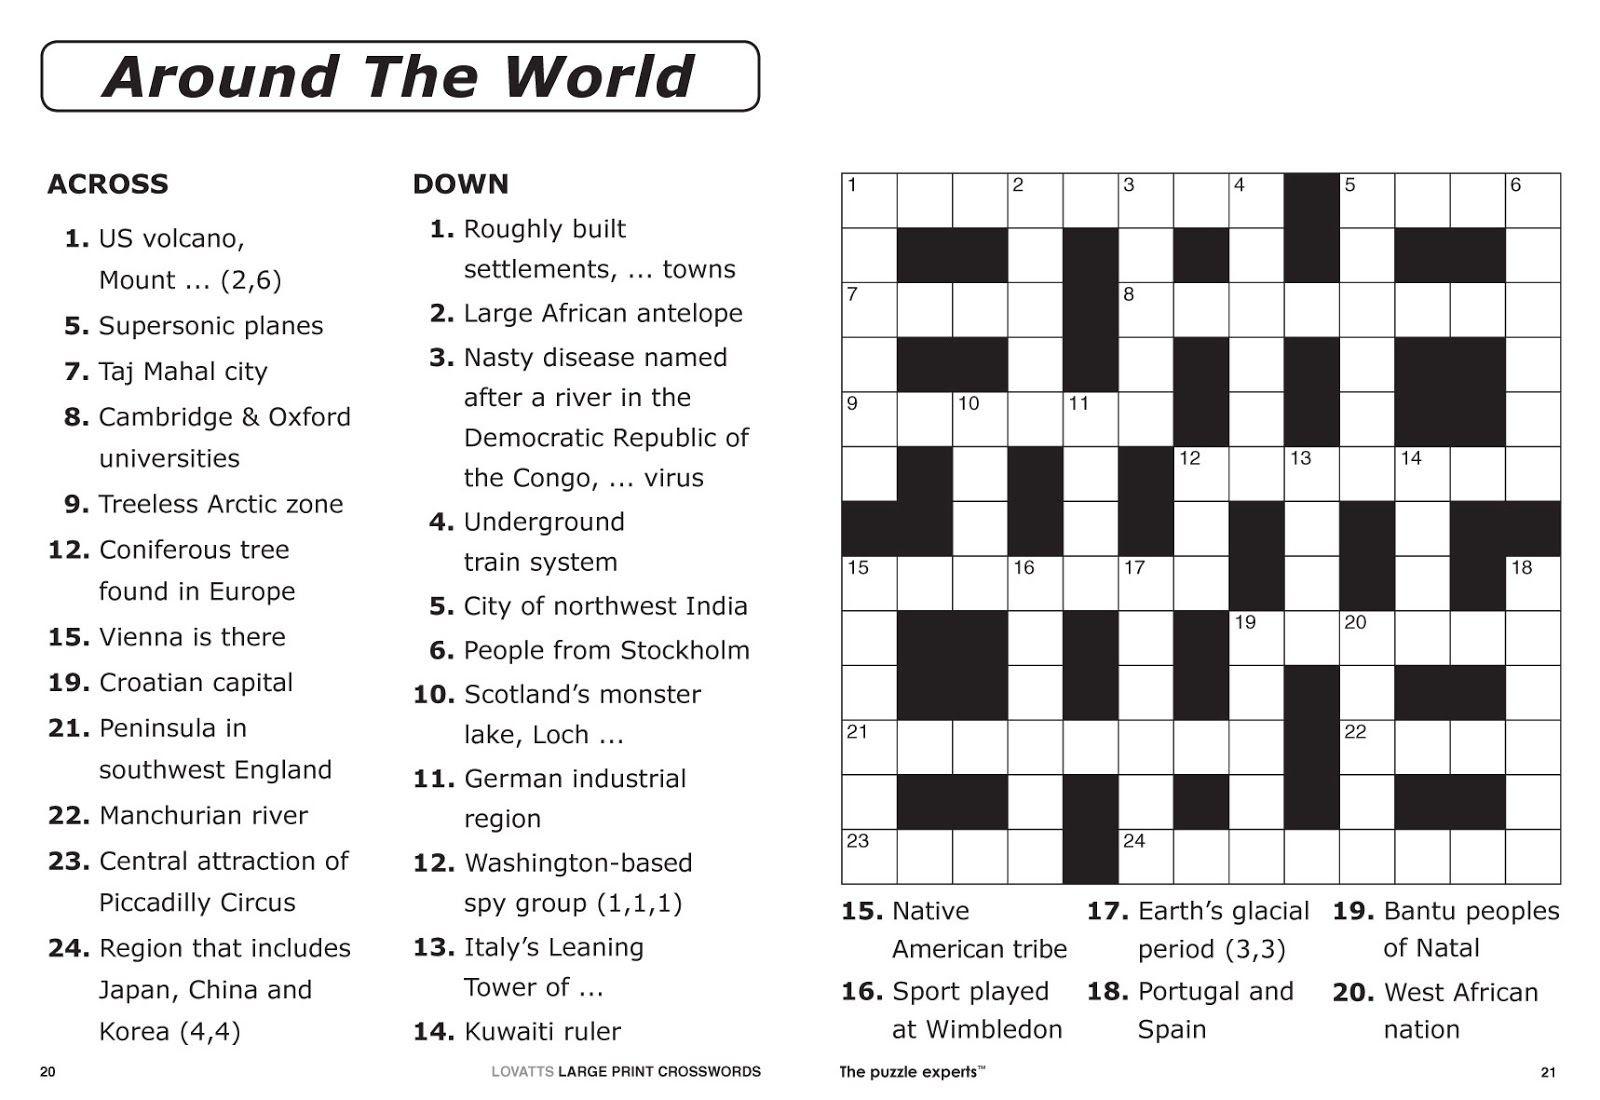 Free Printable Large Print Crossword Puzzles | M3U8 - Free Printable Crossword Puzzles